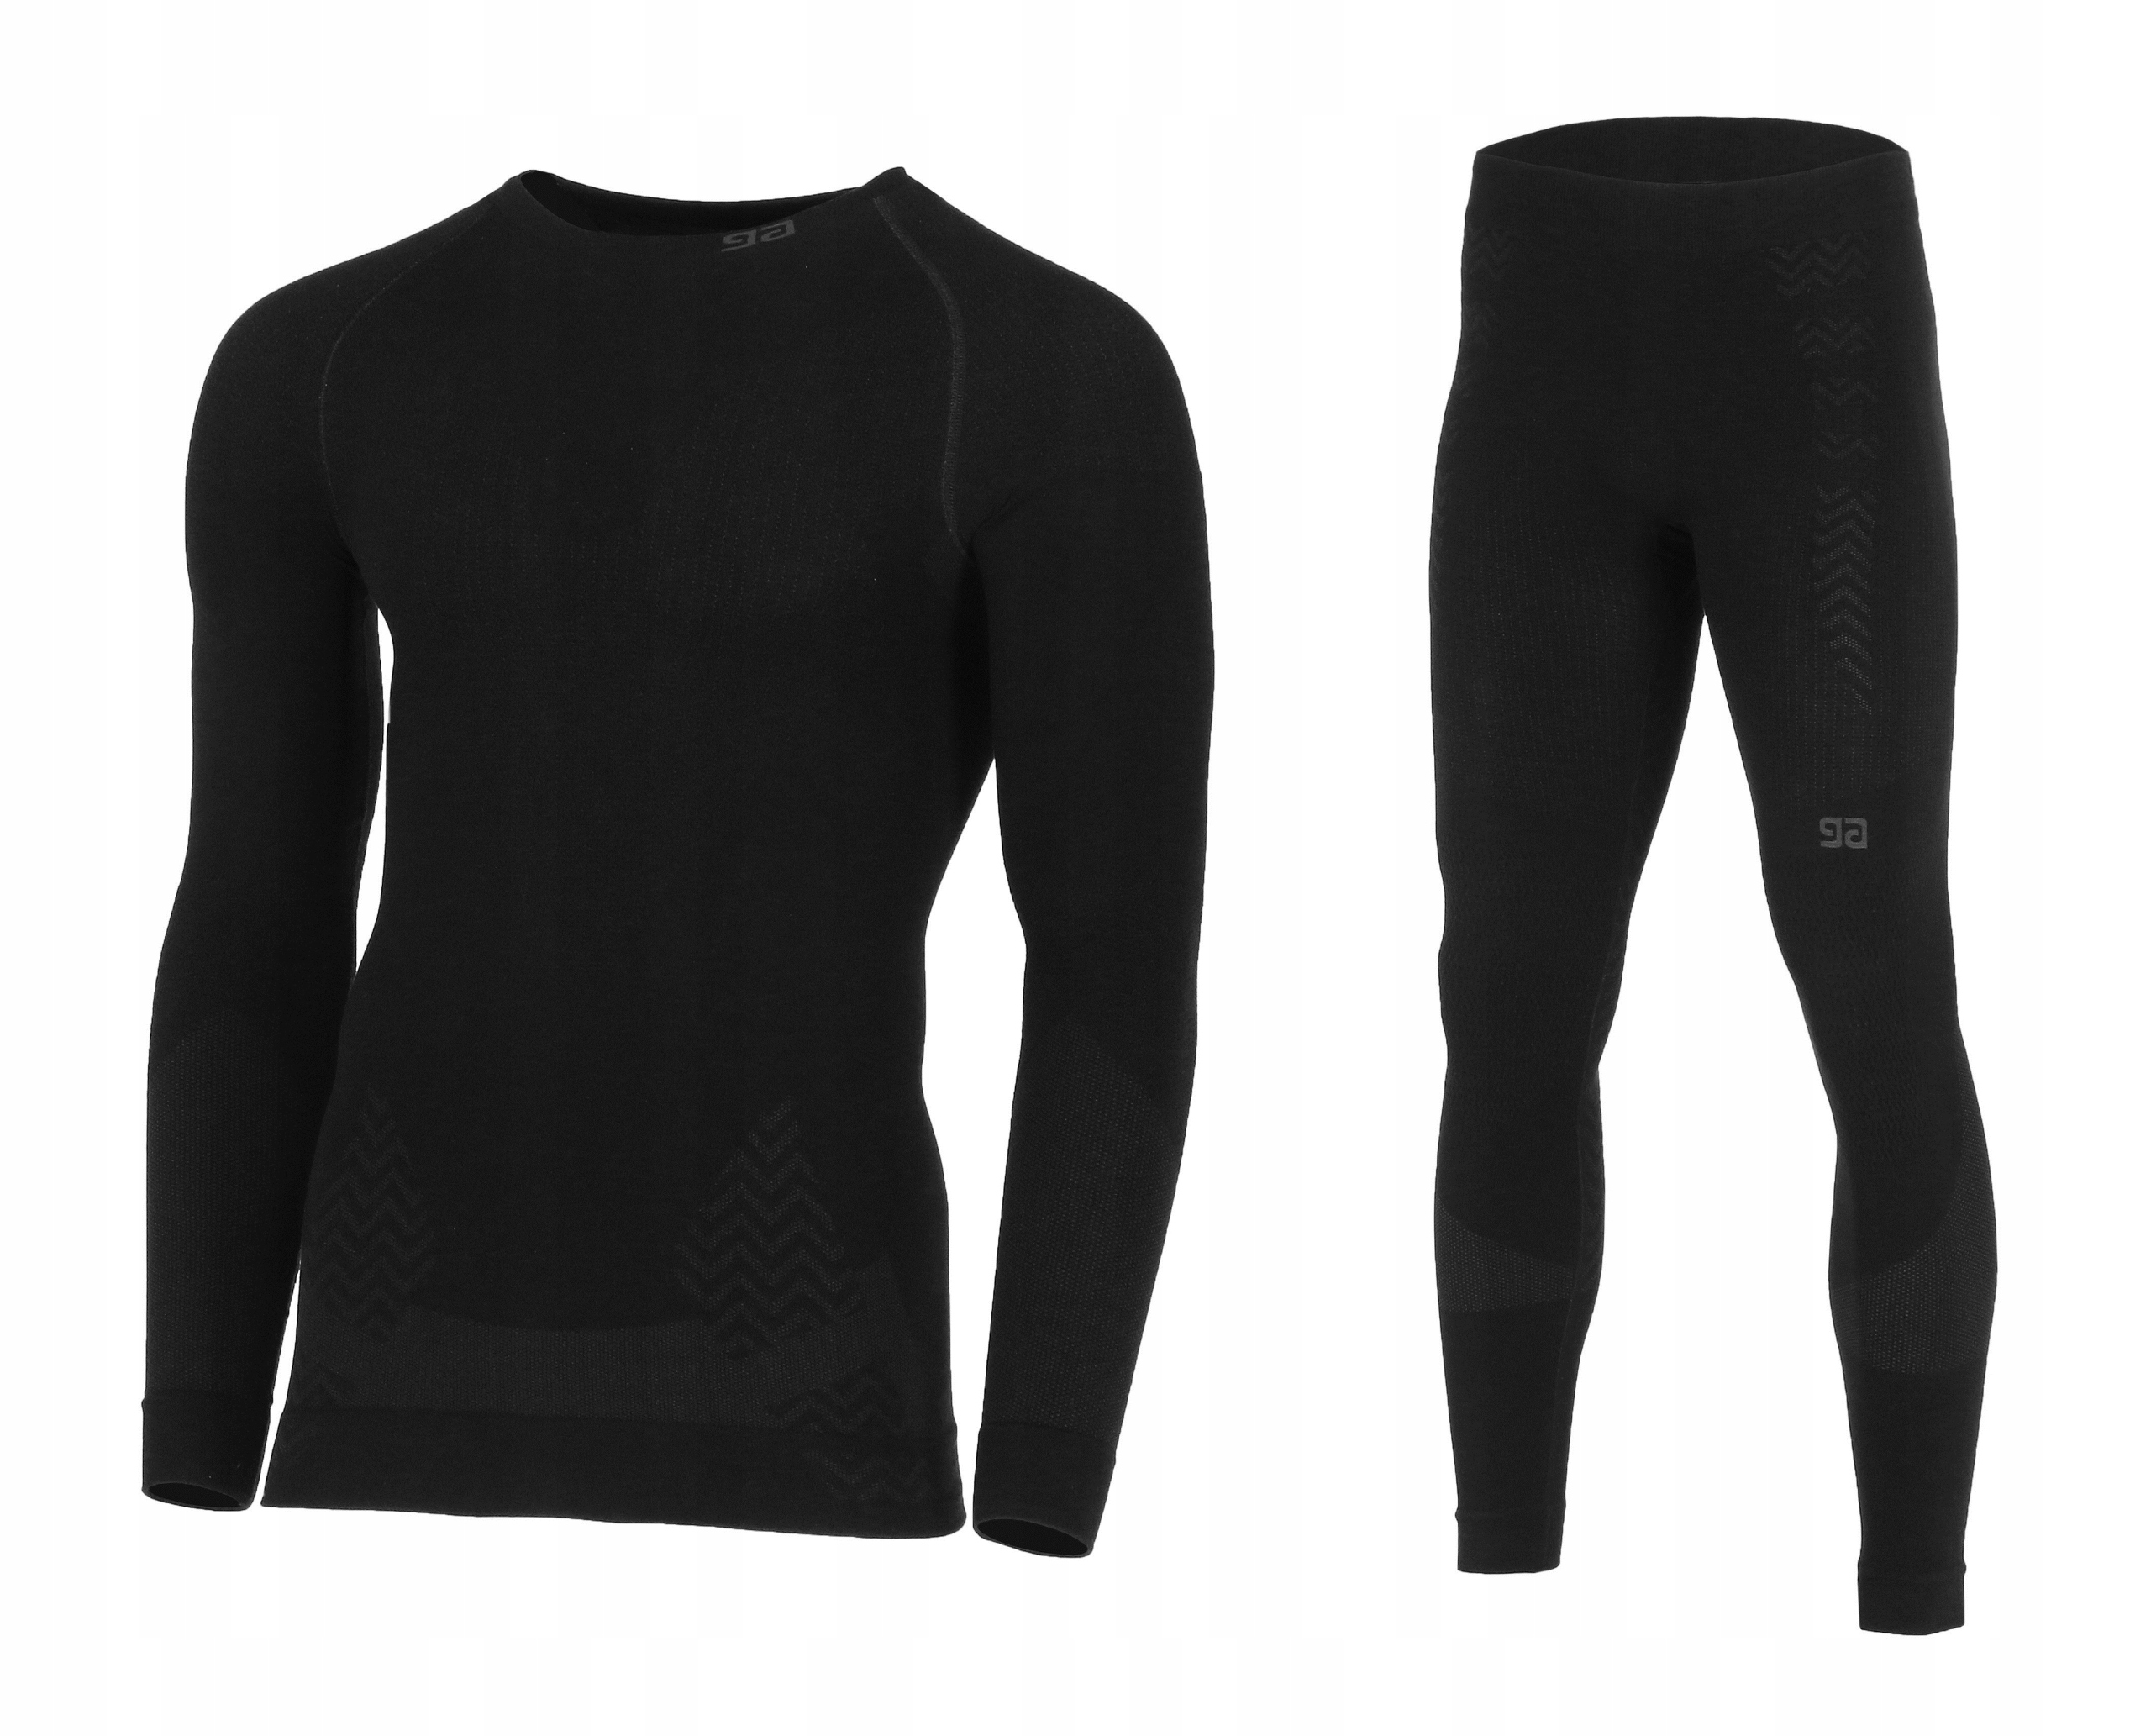 Miyabi termoaktívne spodné prádlo lezenie -30 ° C XL